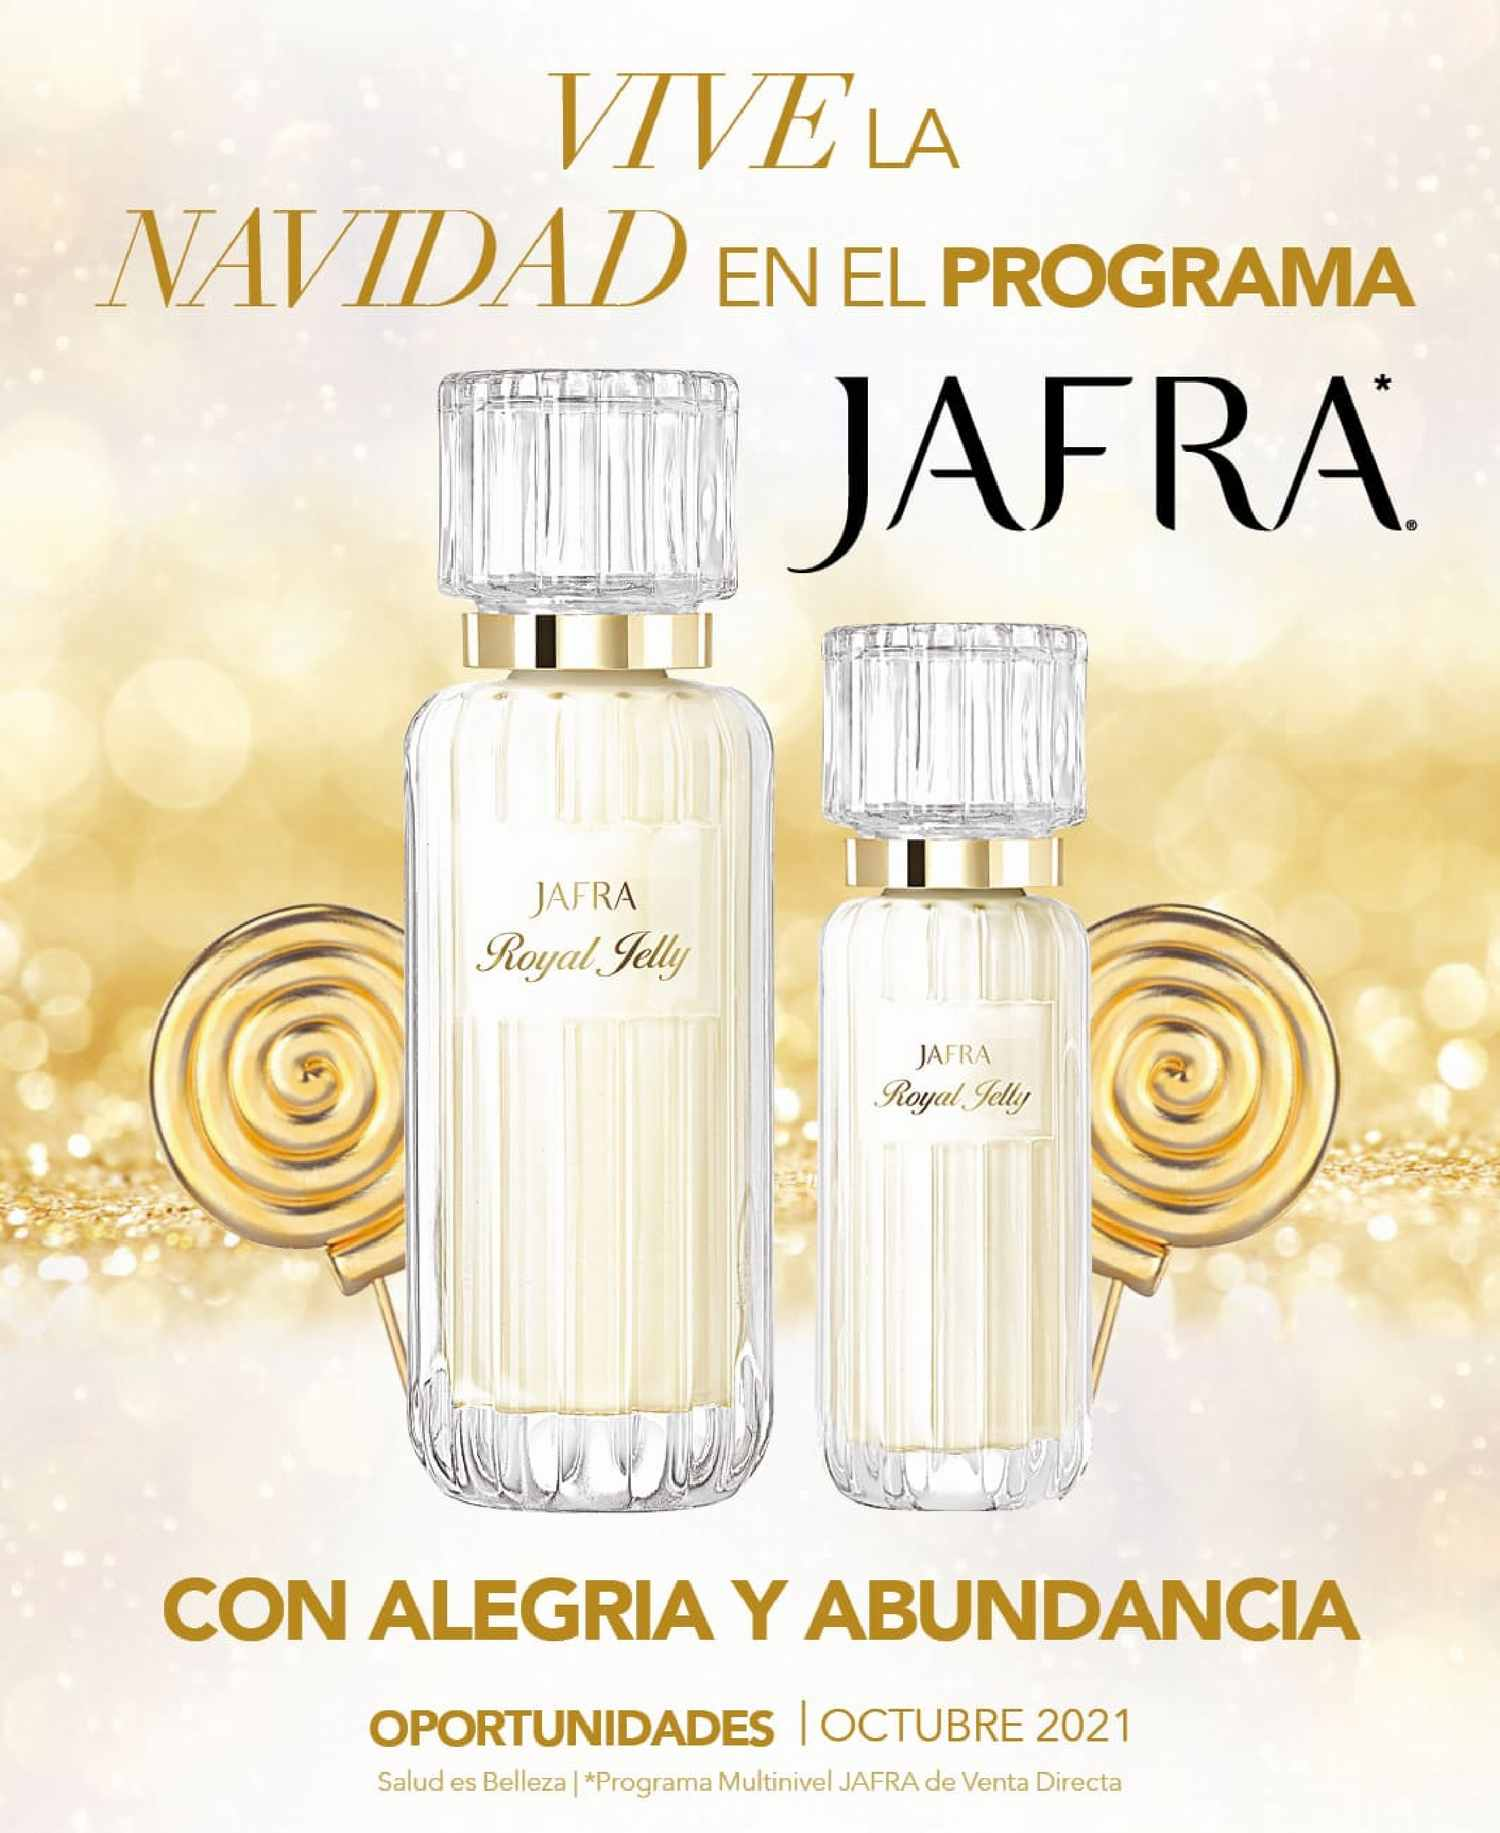 Catalogo Jafra Octubre 2021 México